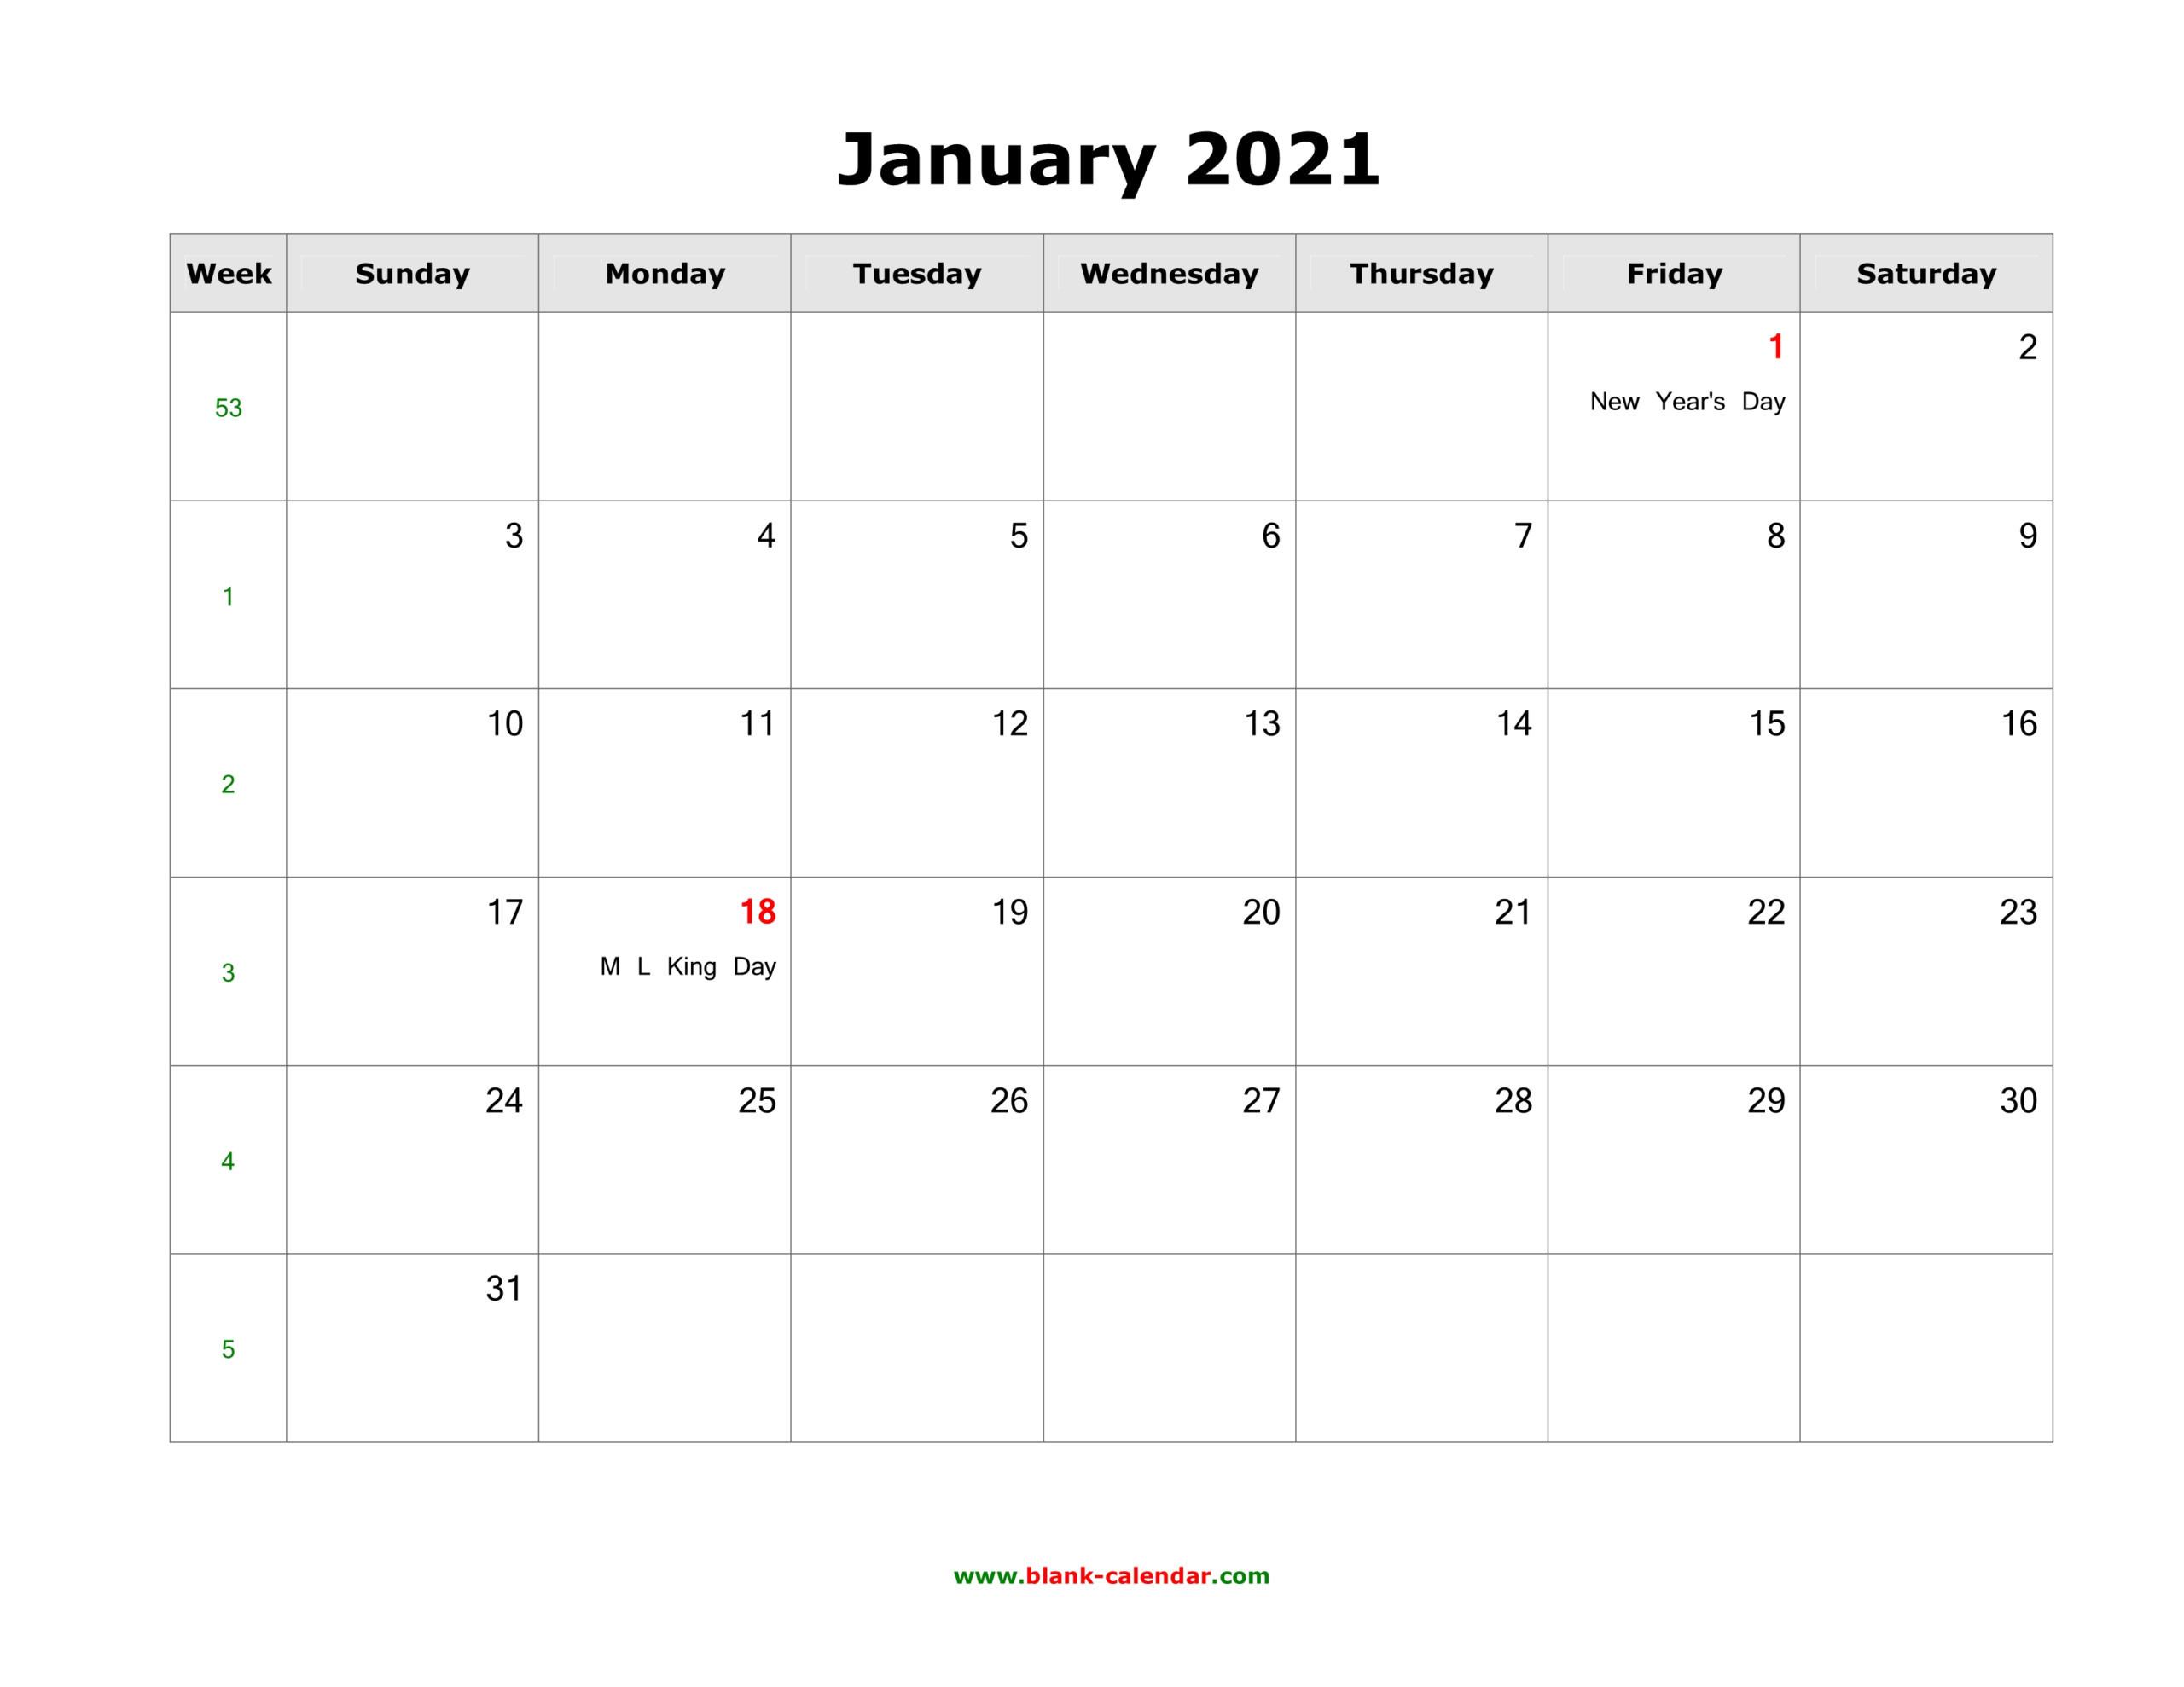 2021 Monthly Us Holidays Calendar | Printable Calendars 2021-2021 Office Vacation Calendar Examples